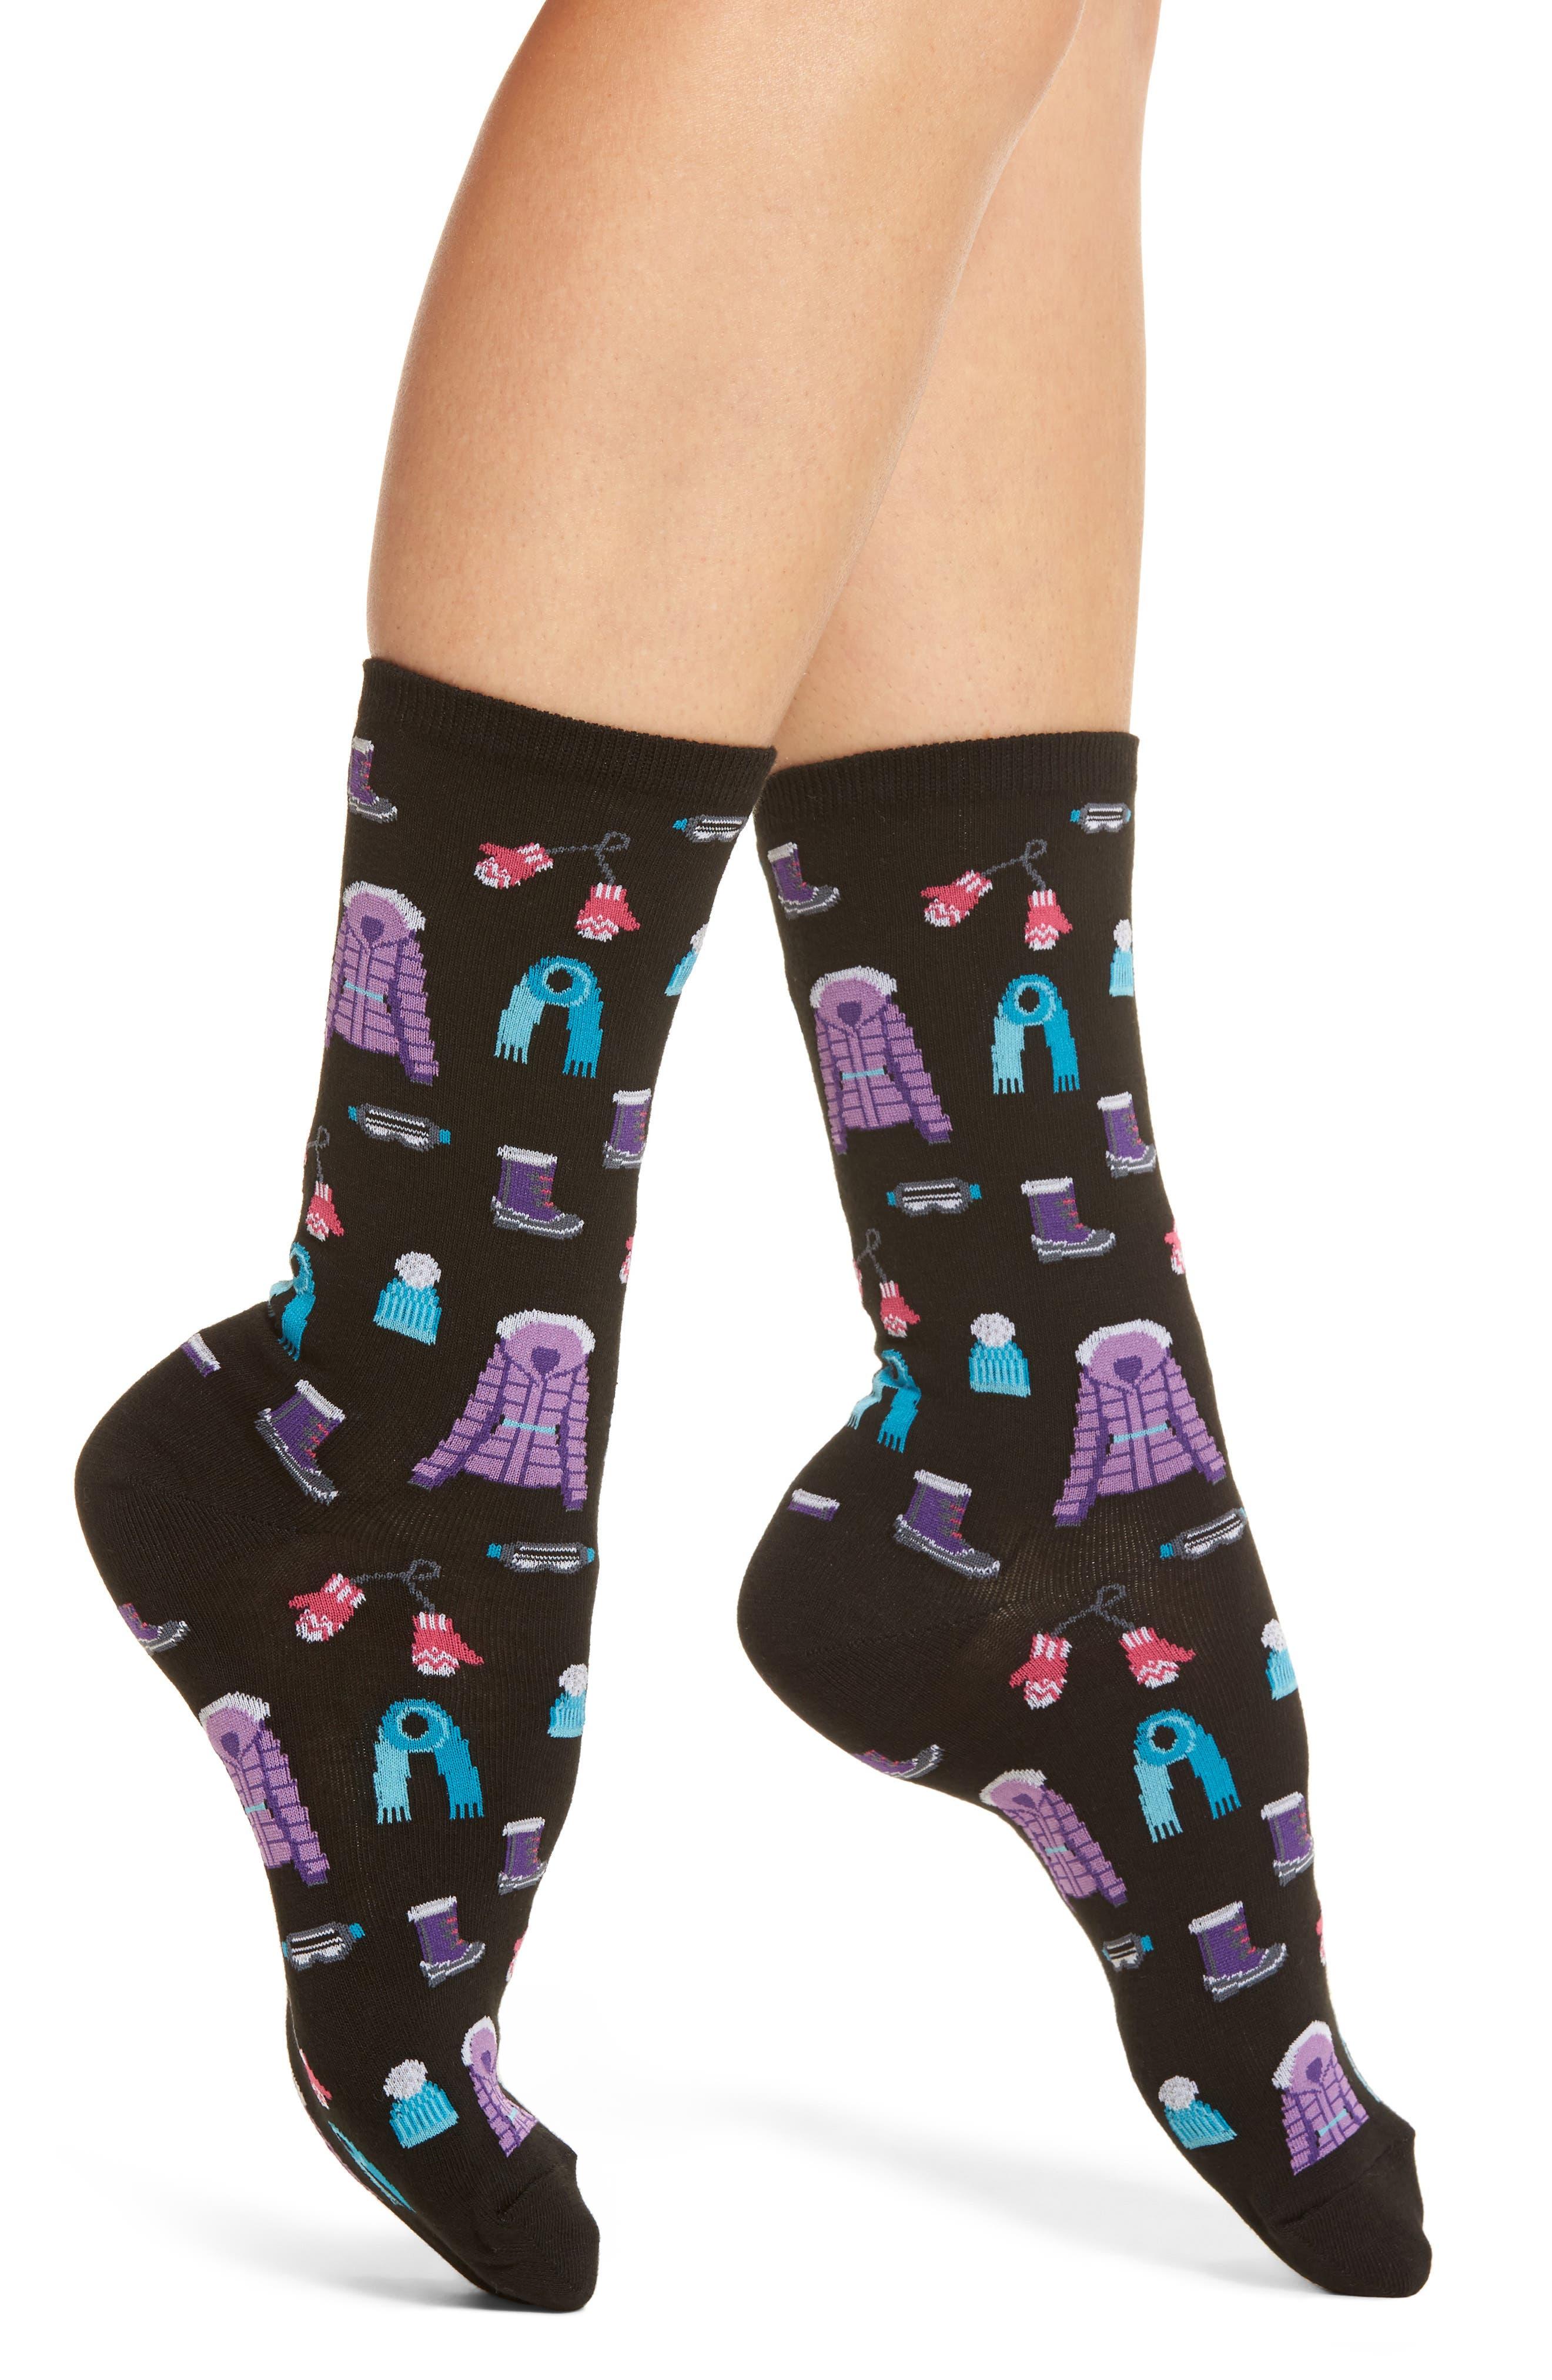 Ski Clothes Crew Socks,                             Main thumbnail 1, color,                             001